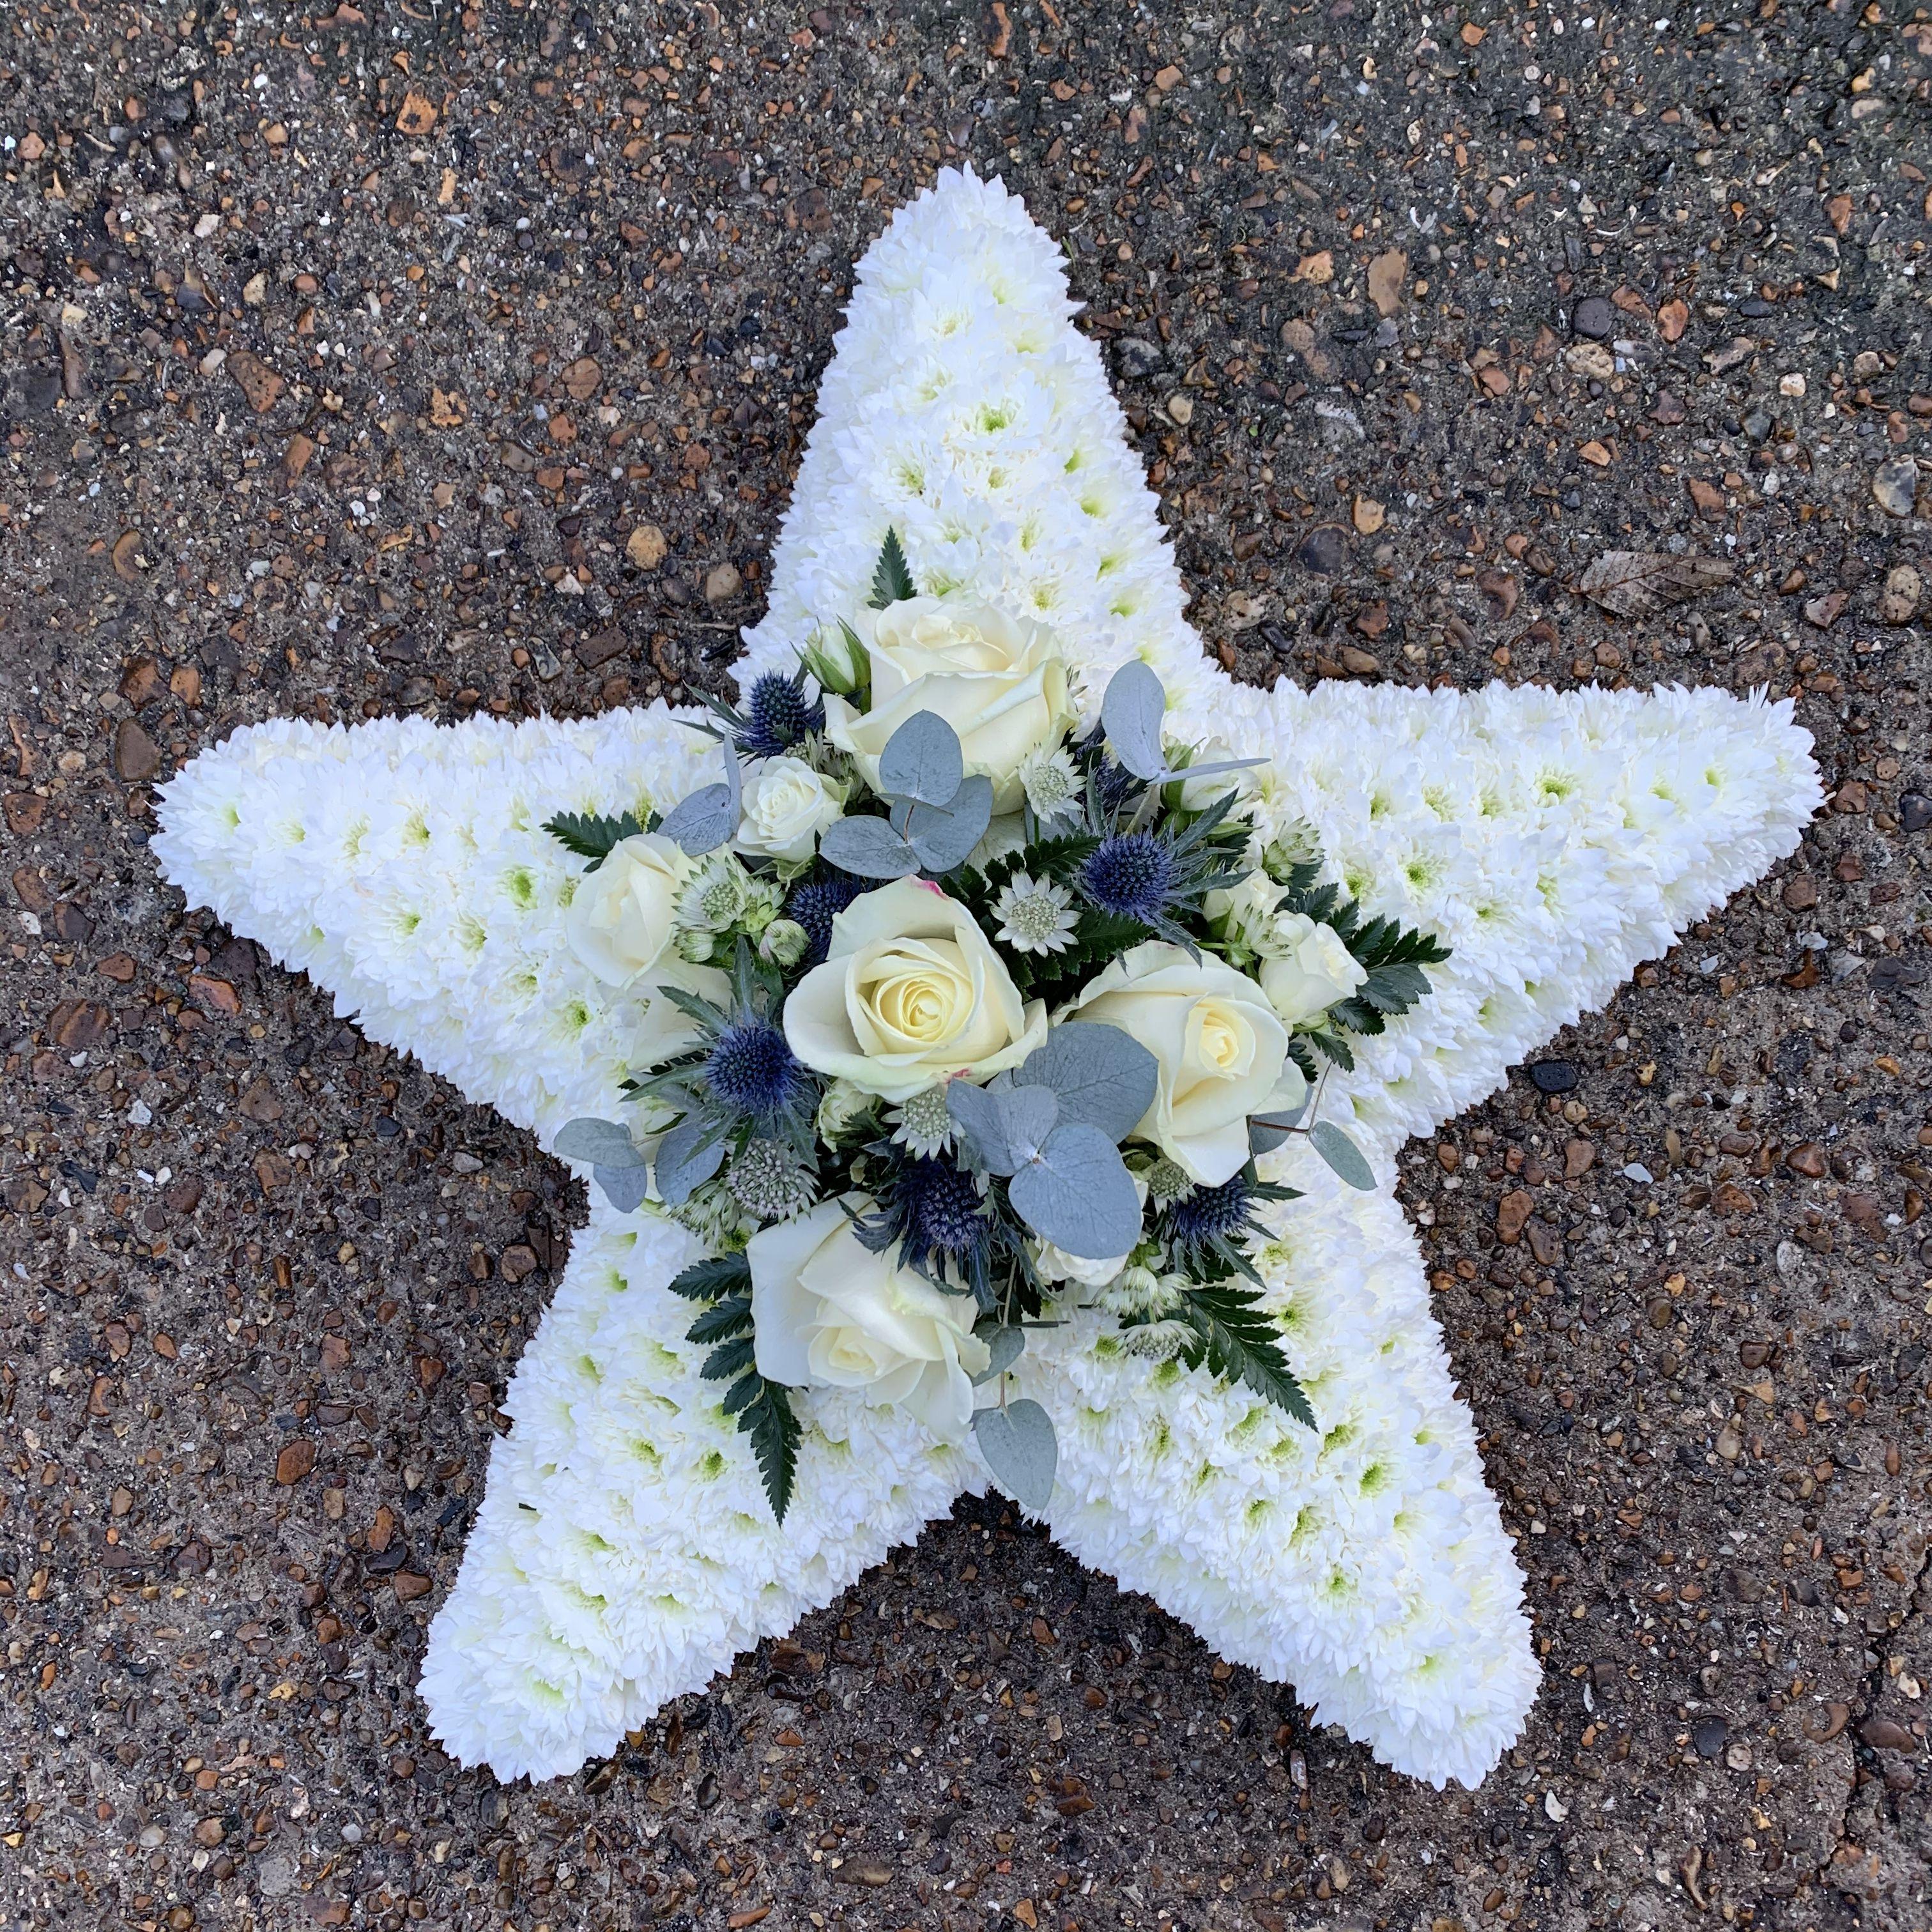 White Star Shape Funeral Flowers Tribute Wreath In 2020 Blumen Gestecke Blumengestecke Beerdigung Blumen